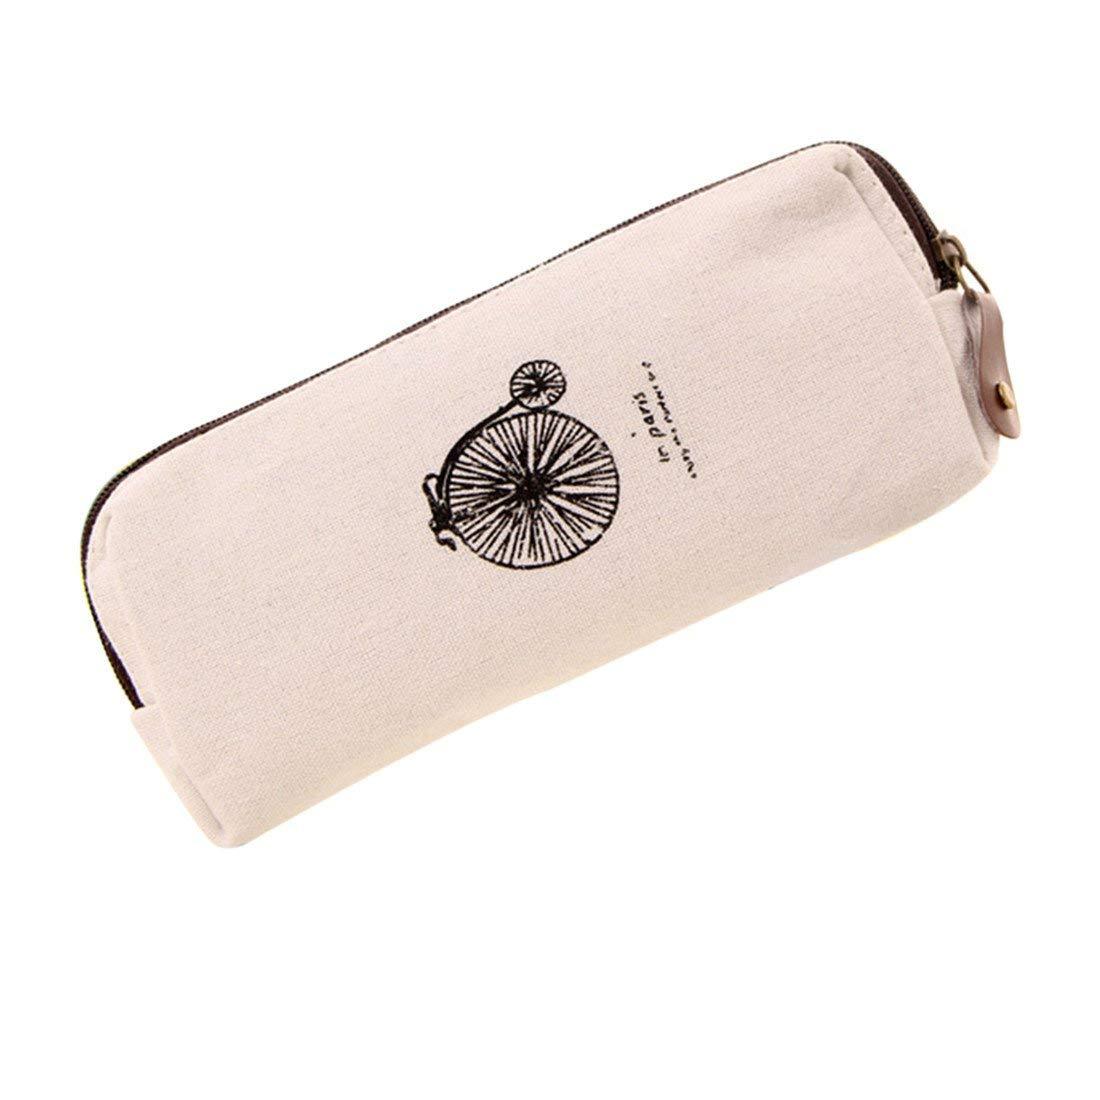 ASKCUT Pen Pencil Case,Retro Paris Style Cotton and Linen Canvas Large-capacity Multifunctional Storage Bag Creative Pure Color Stationery Bag (cream-colored)